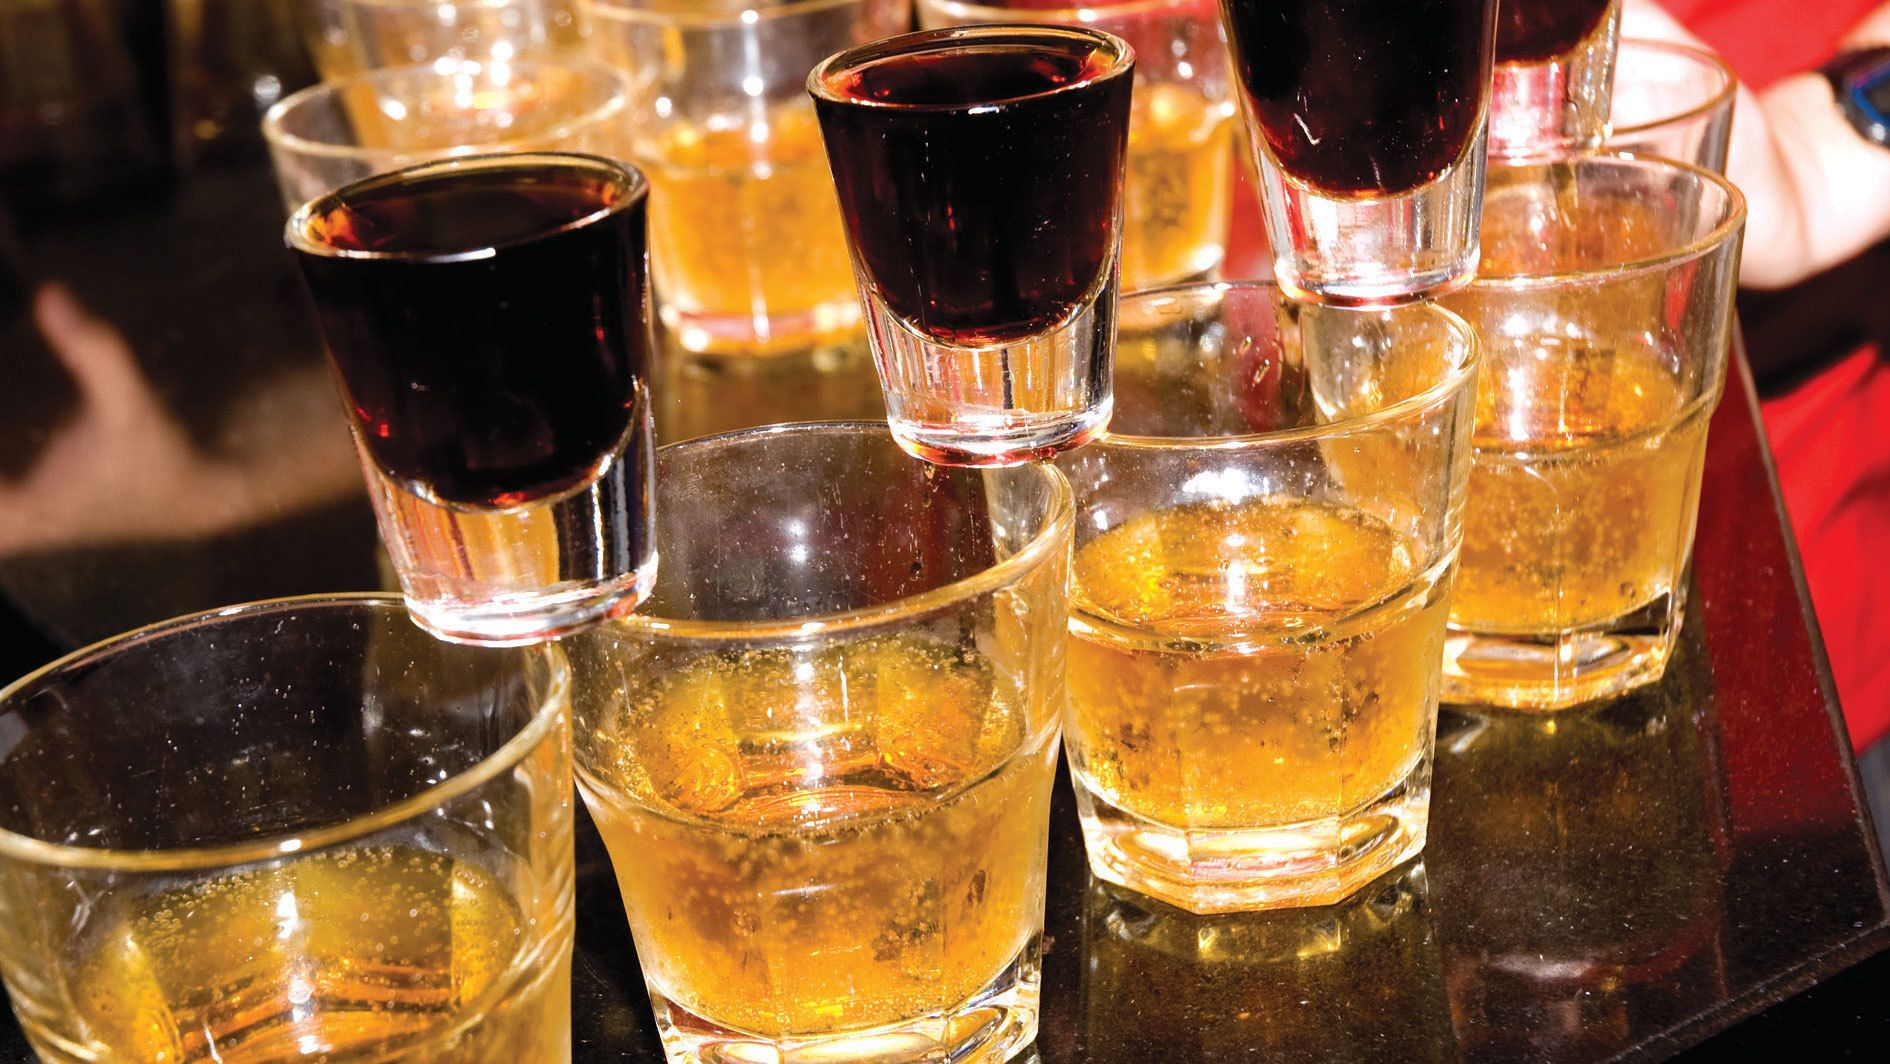 Cibo, bevande e vita notturna